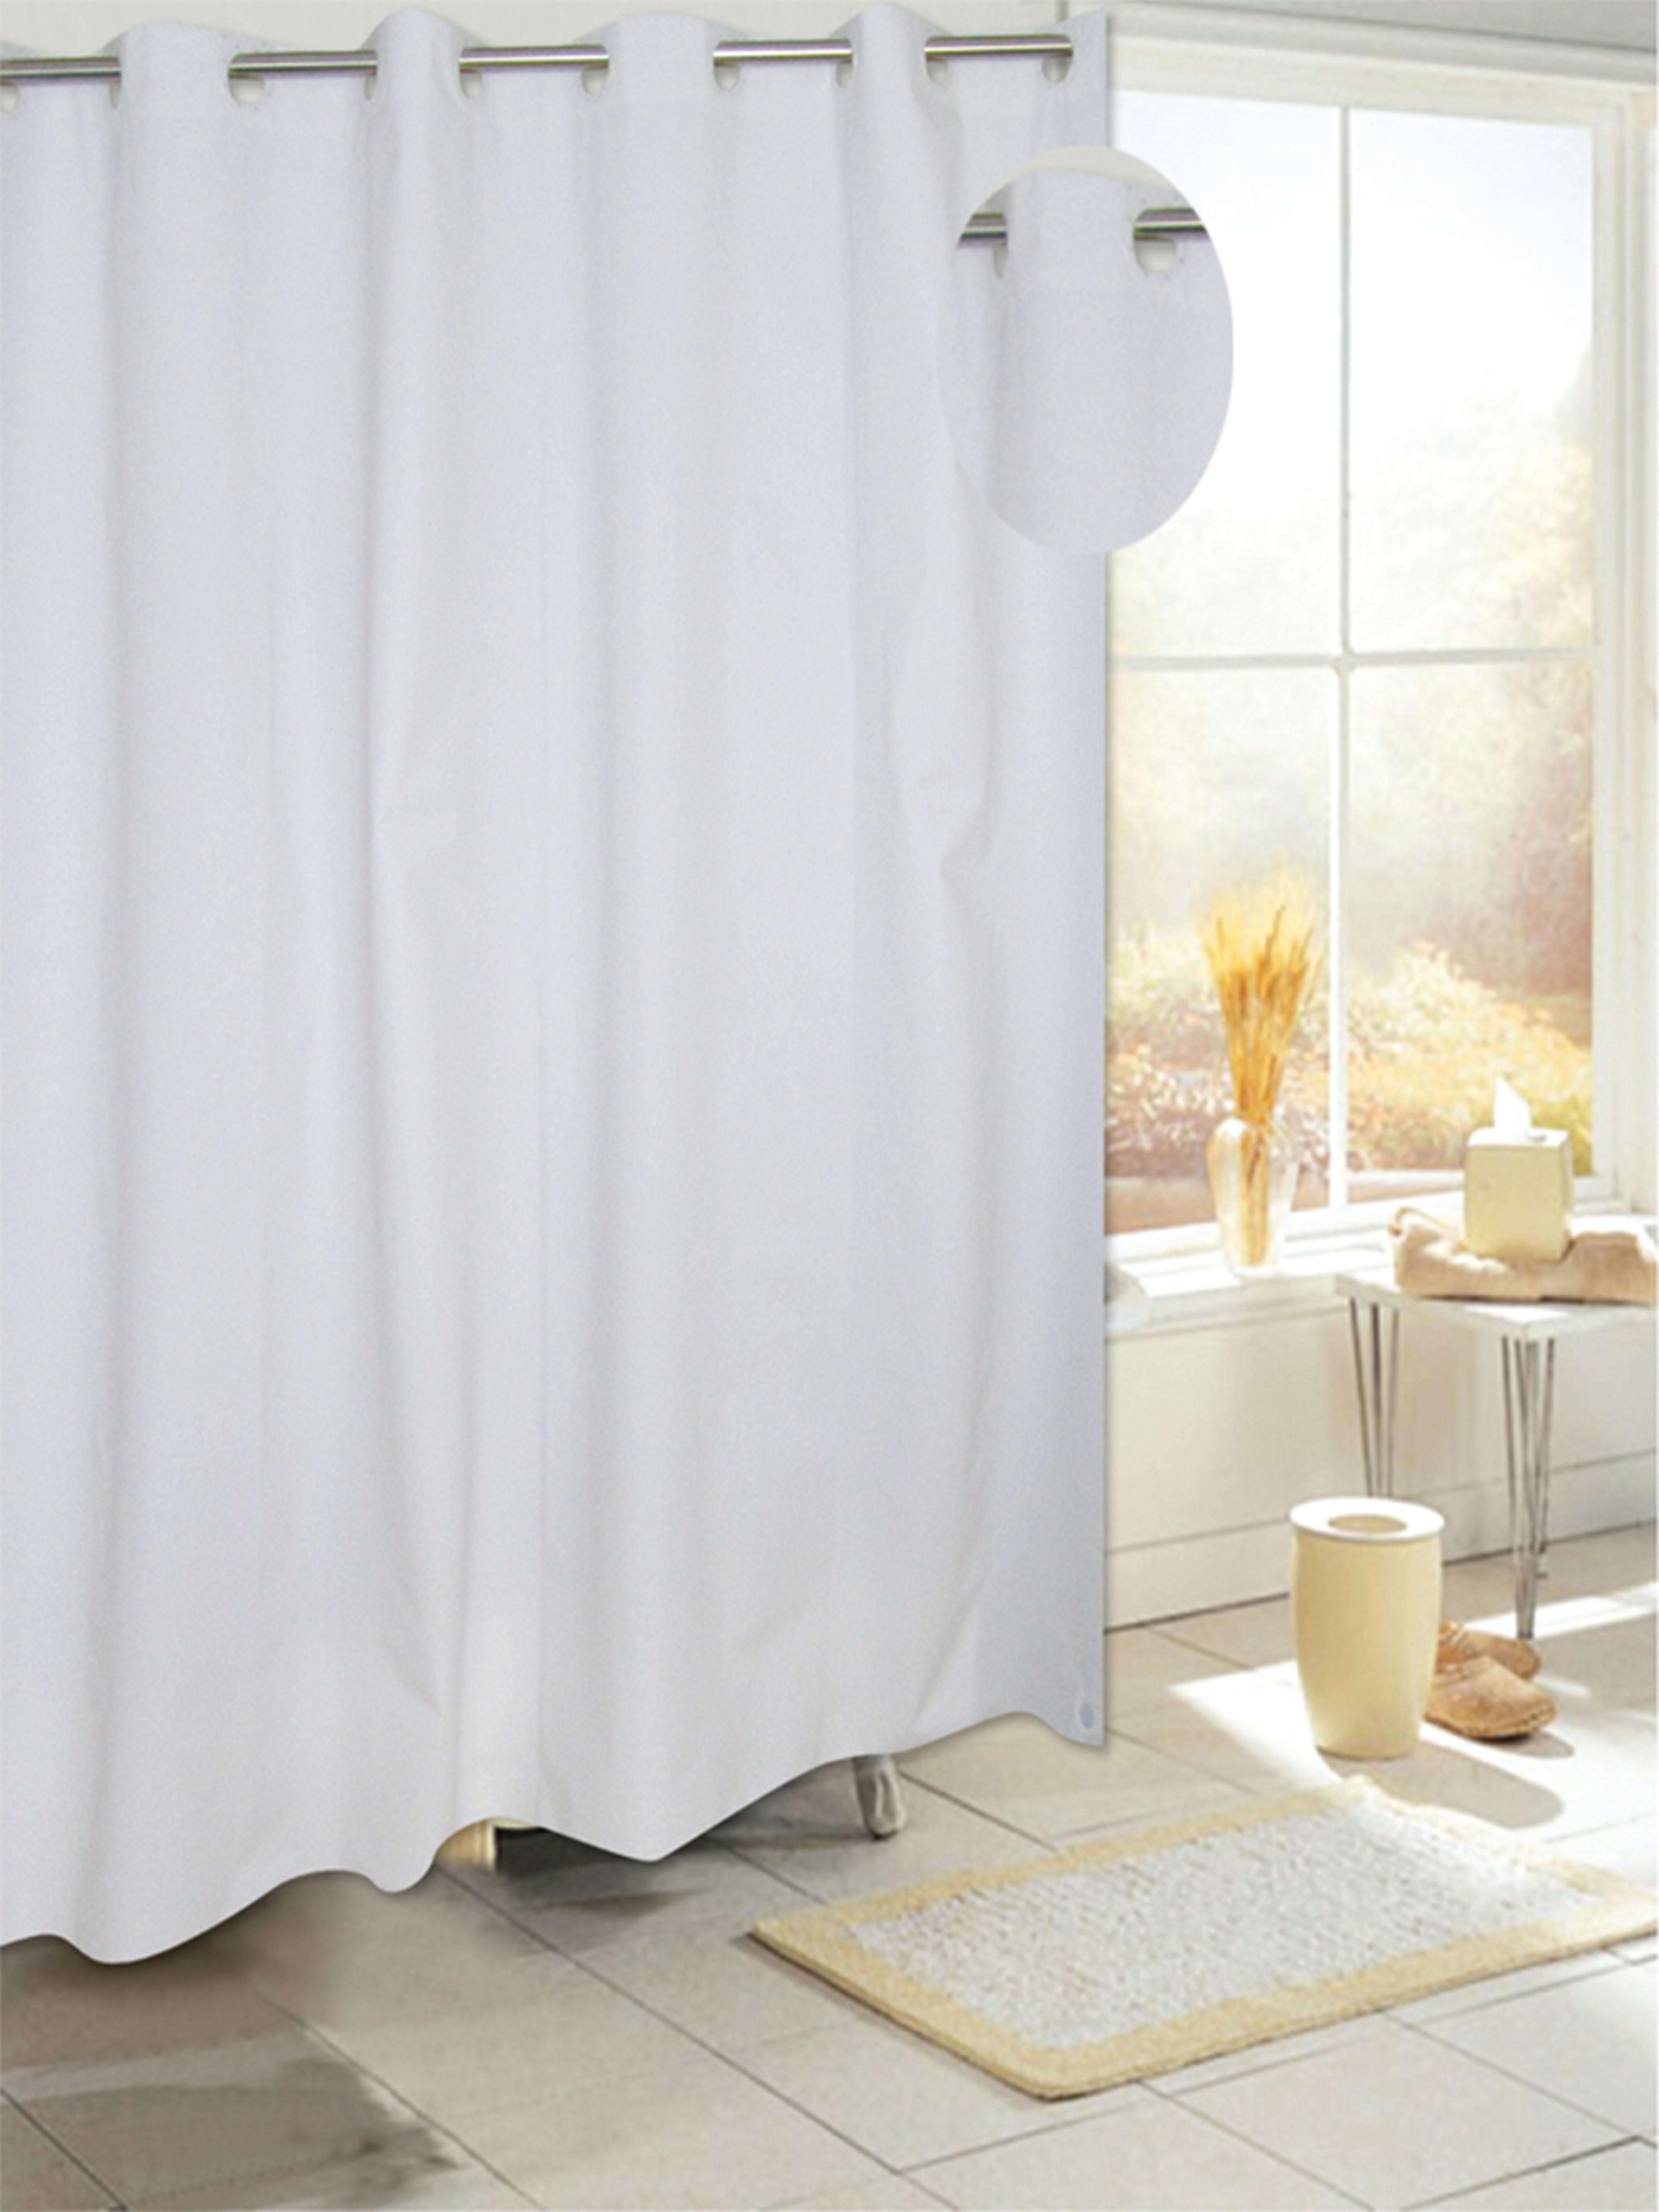 034 Ez On EVA Shower Curtain With